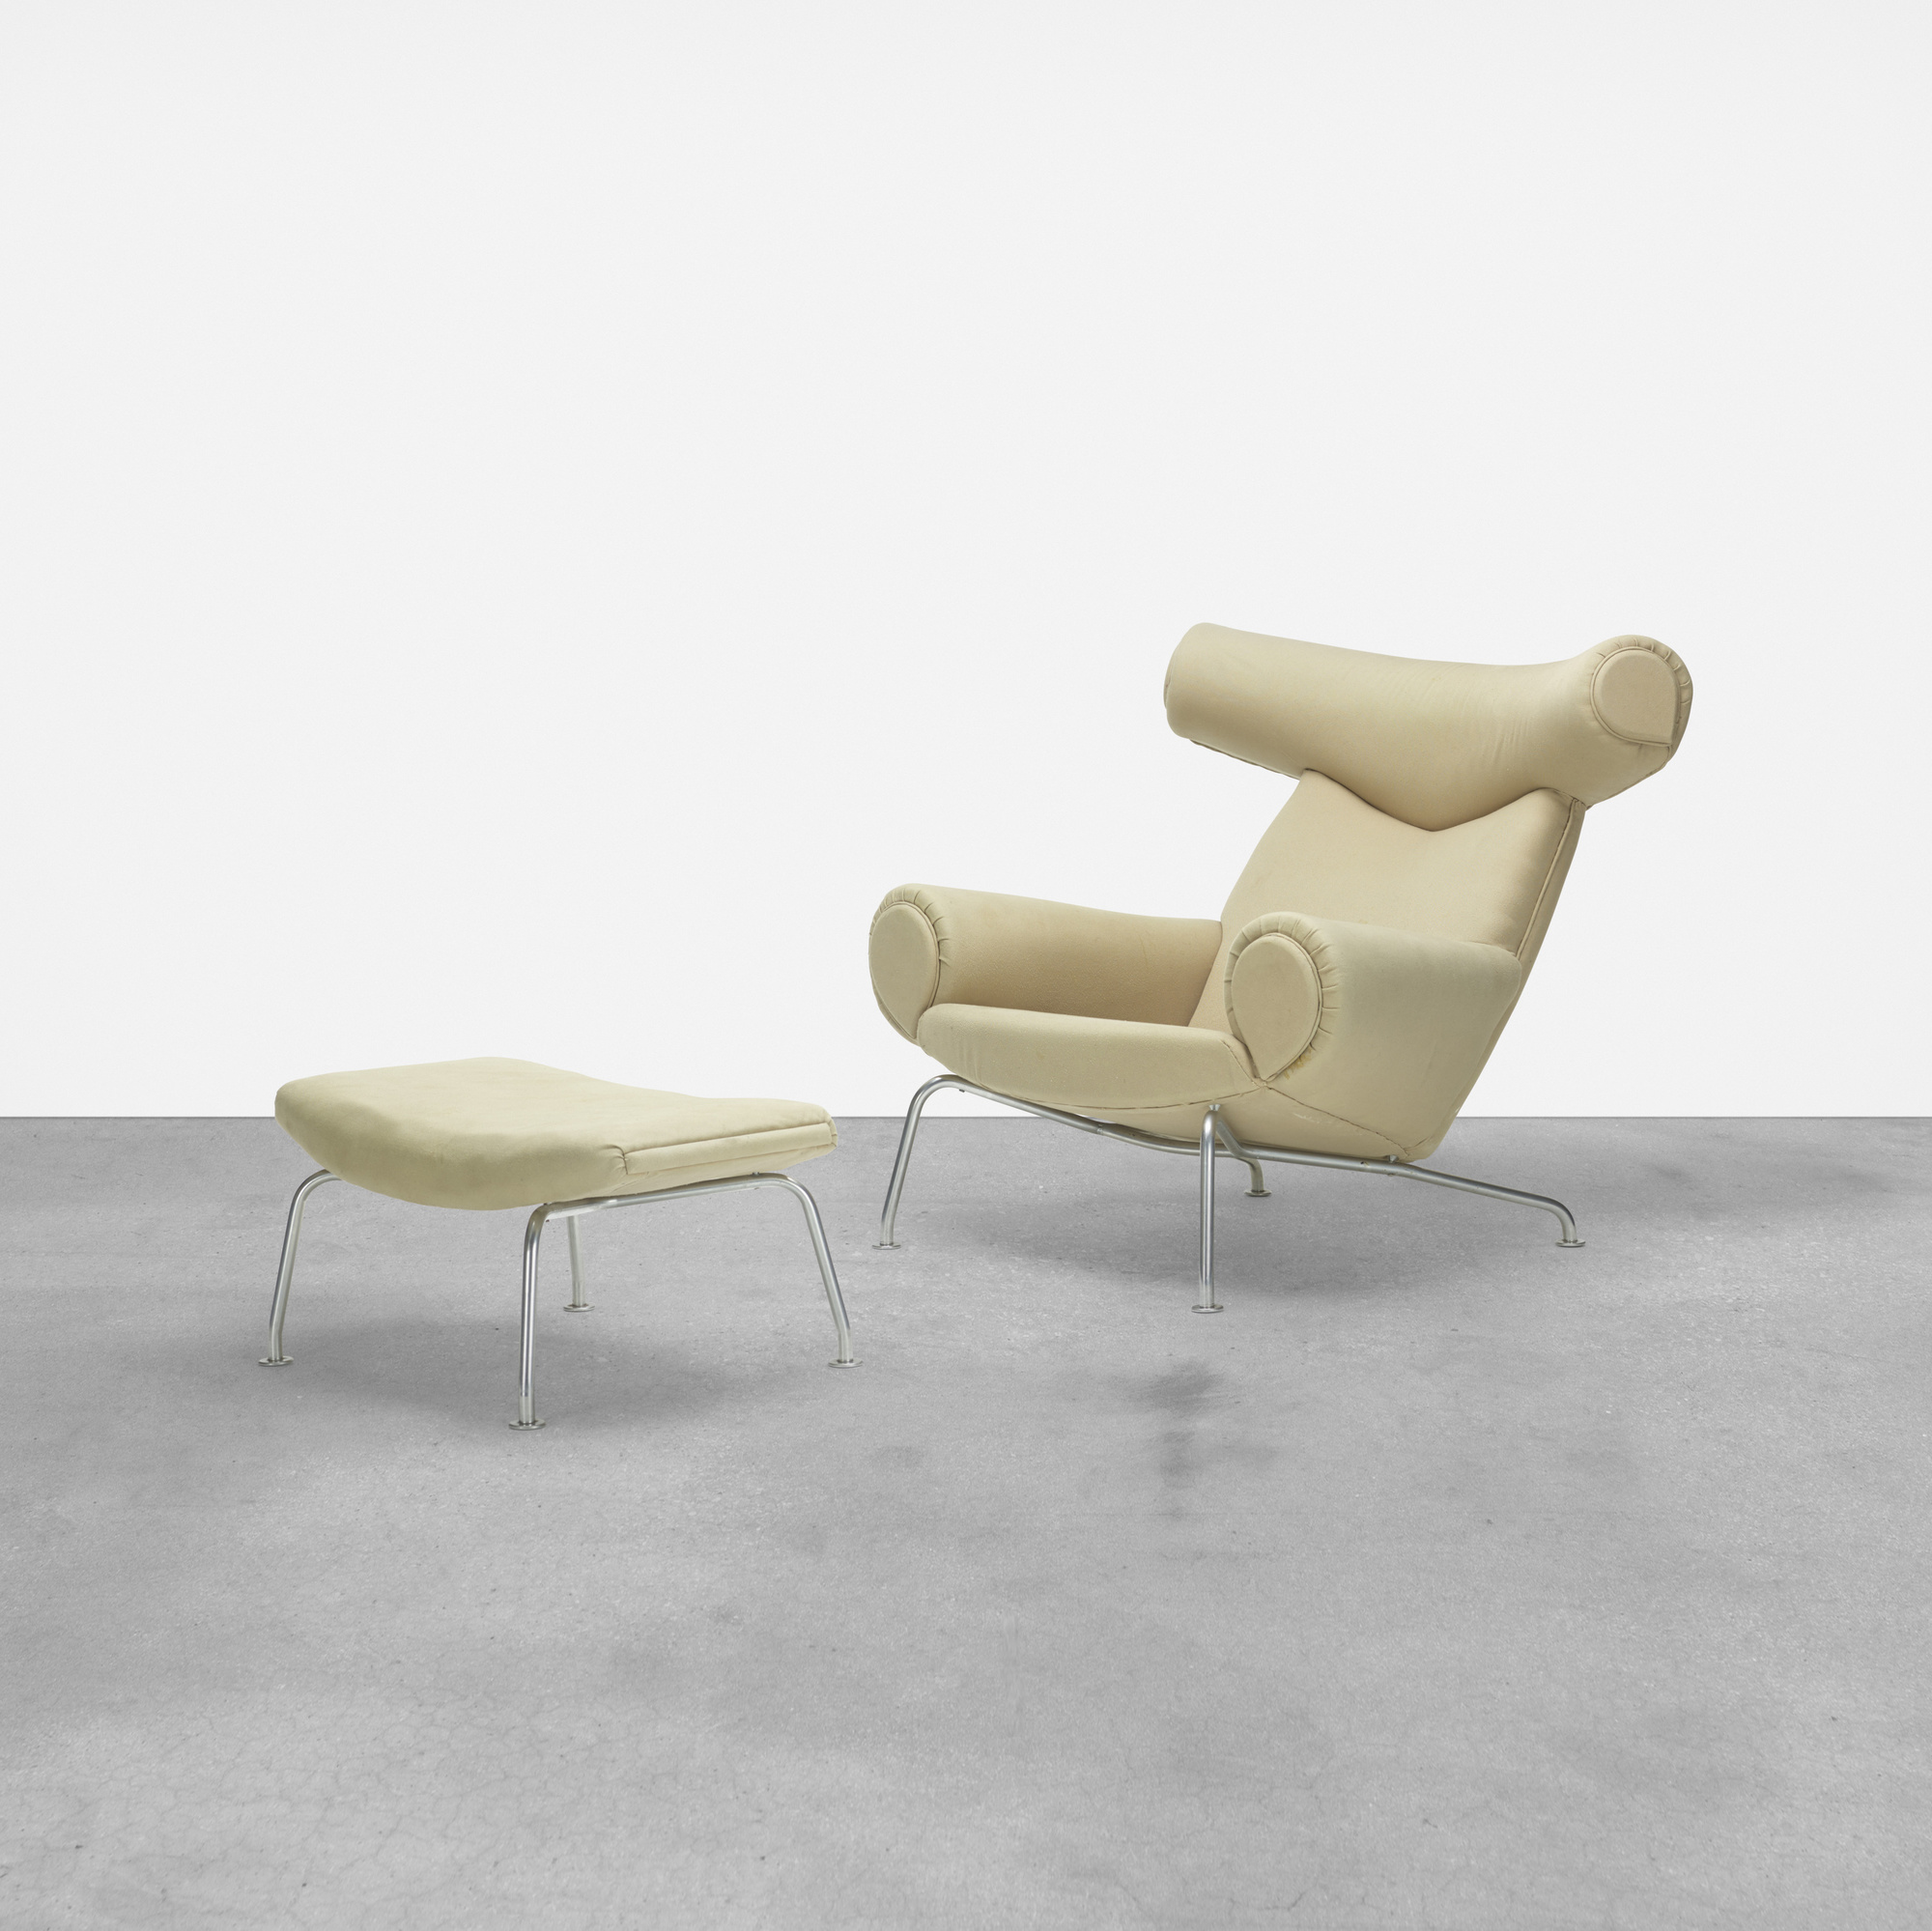 156: Hans J. Wegner / Ox chair and ottoman (1 of 4)